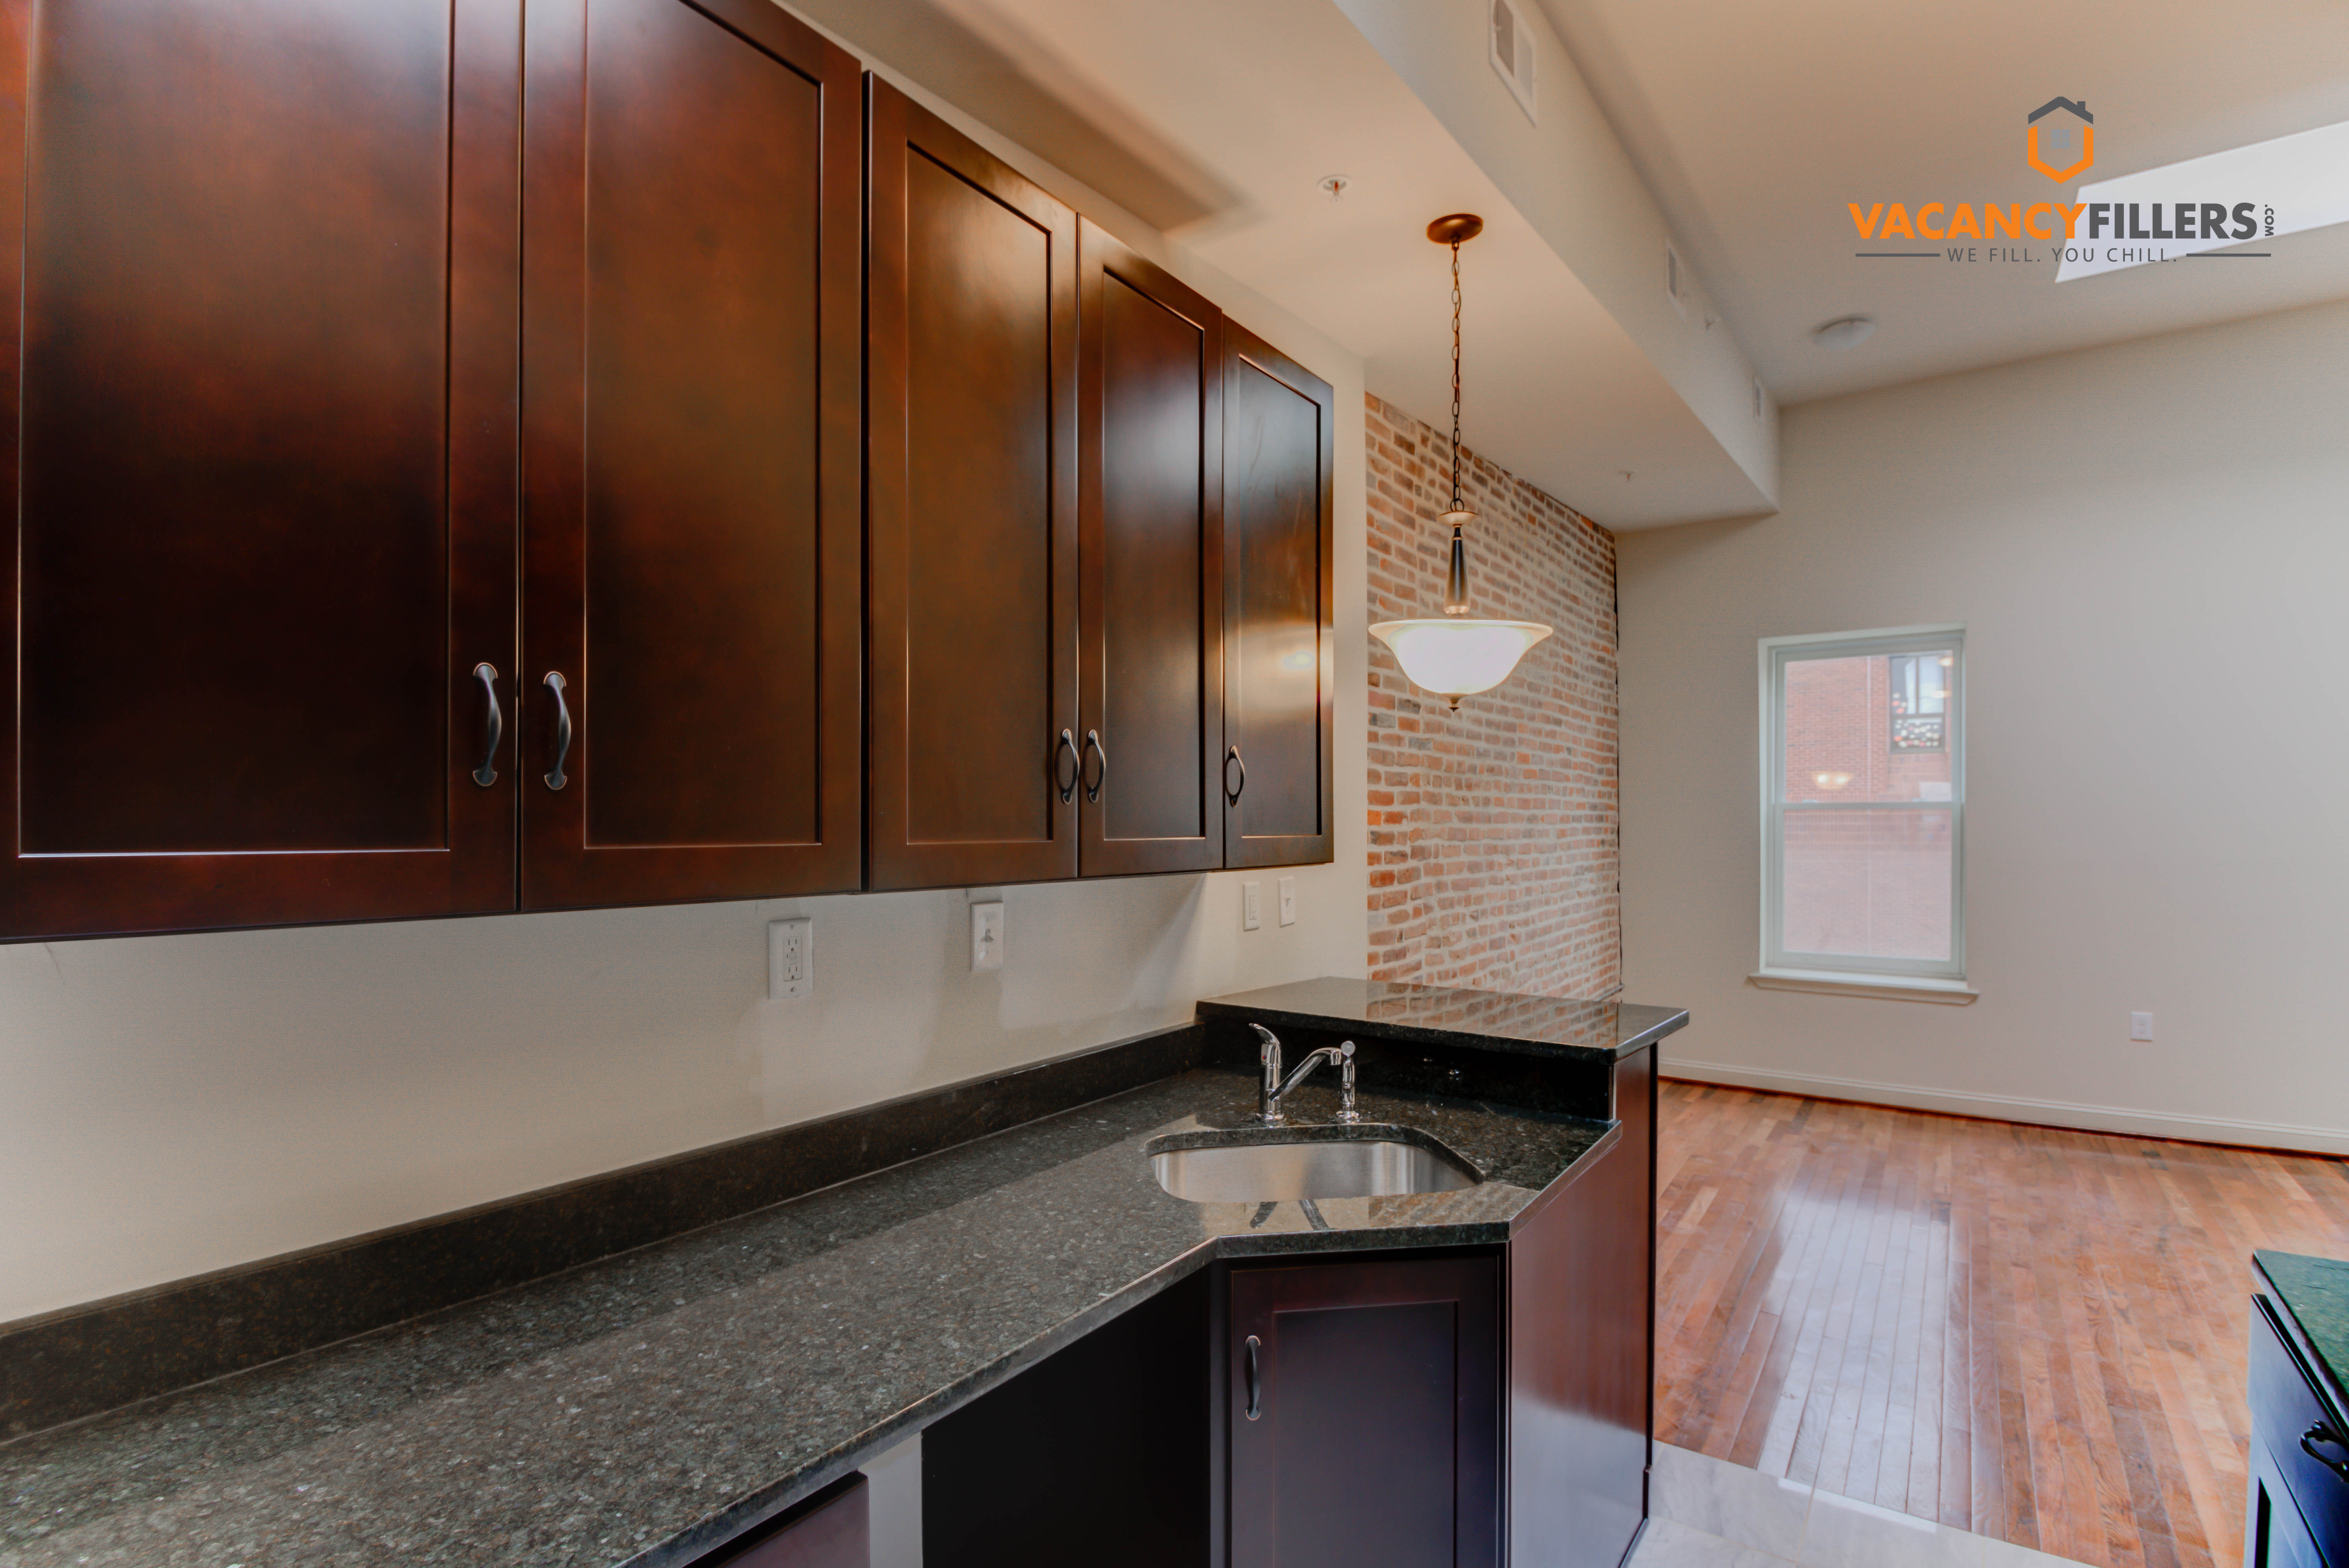 Charles Village 1 Bedroom Rental At 2024 N Calvert St Baltimore Md 21218 4 1175 Apartable